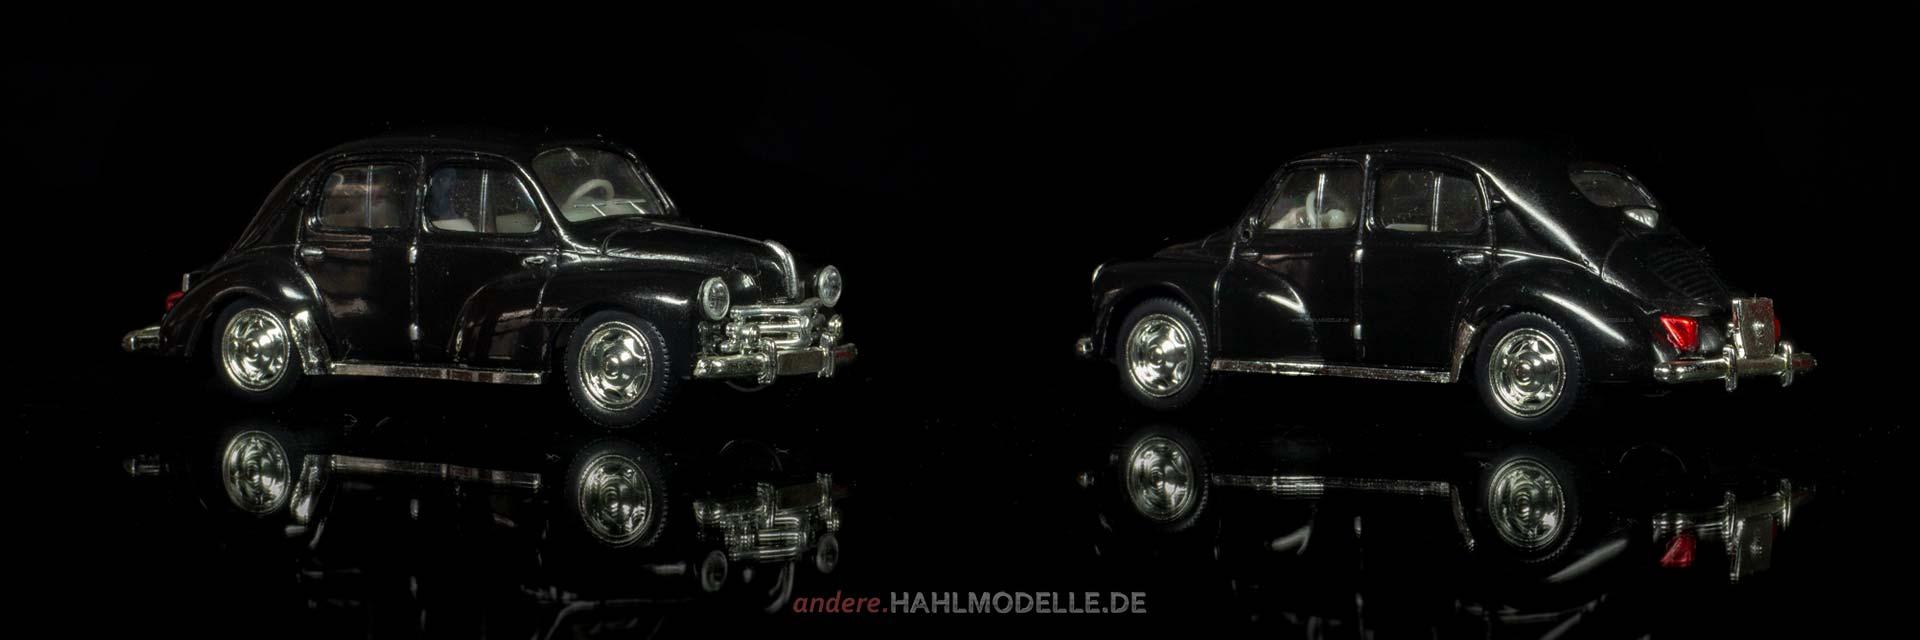 Renault 4 CV | Limousine | Ixo | 1:43 | www.andere.hahlmodelle.de